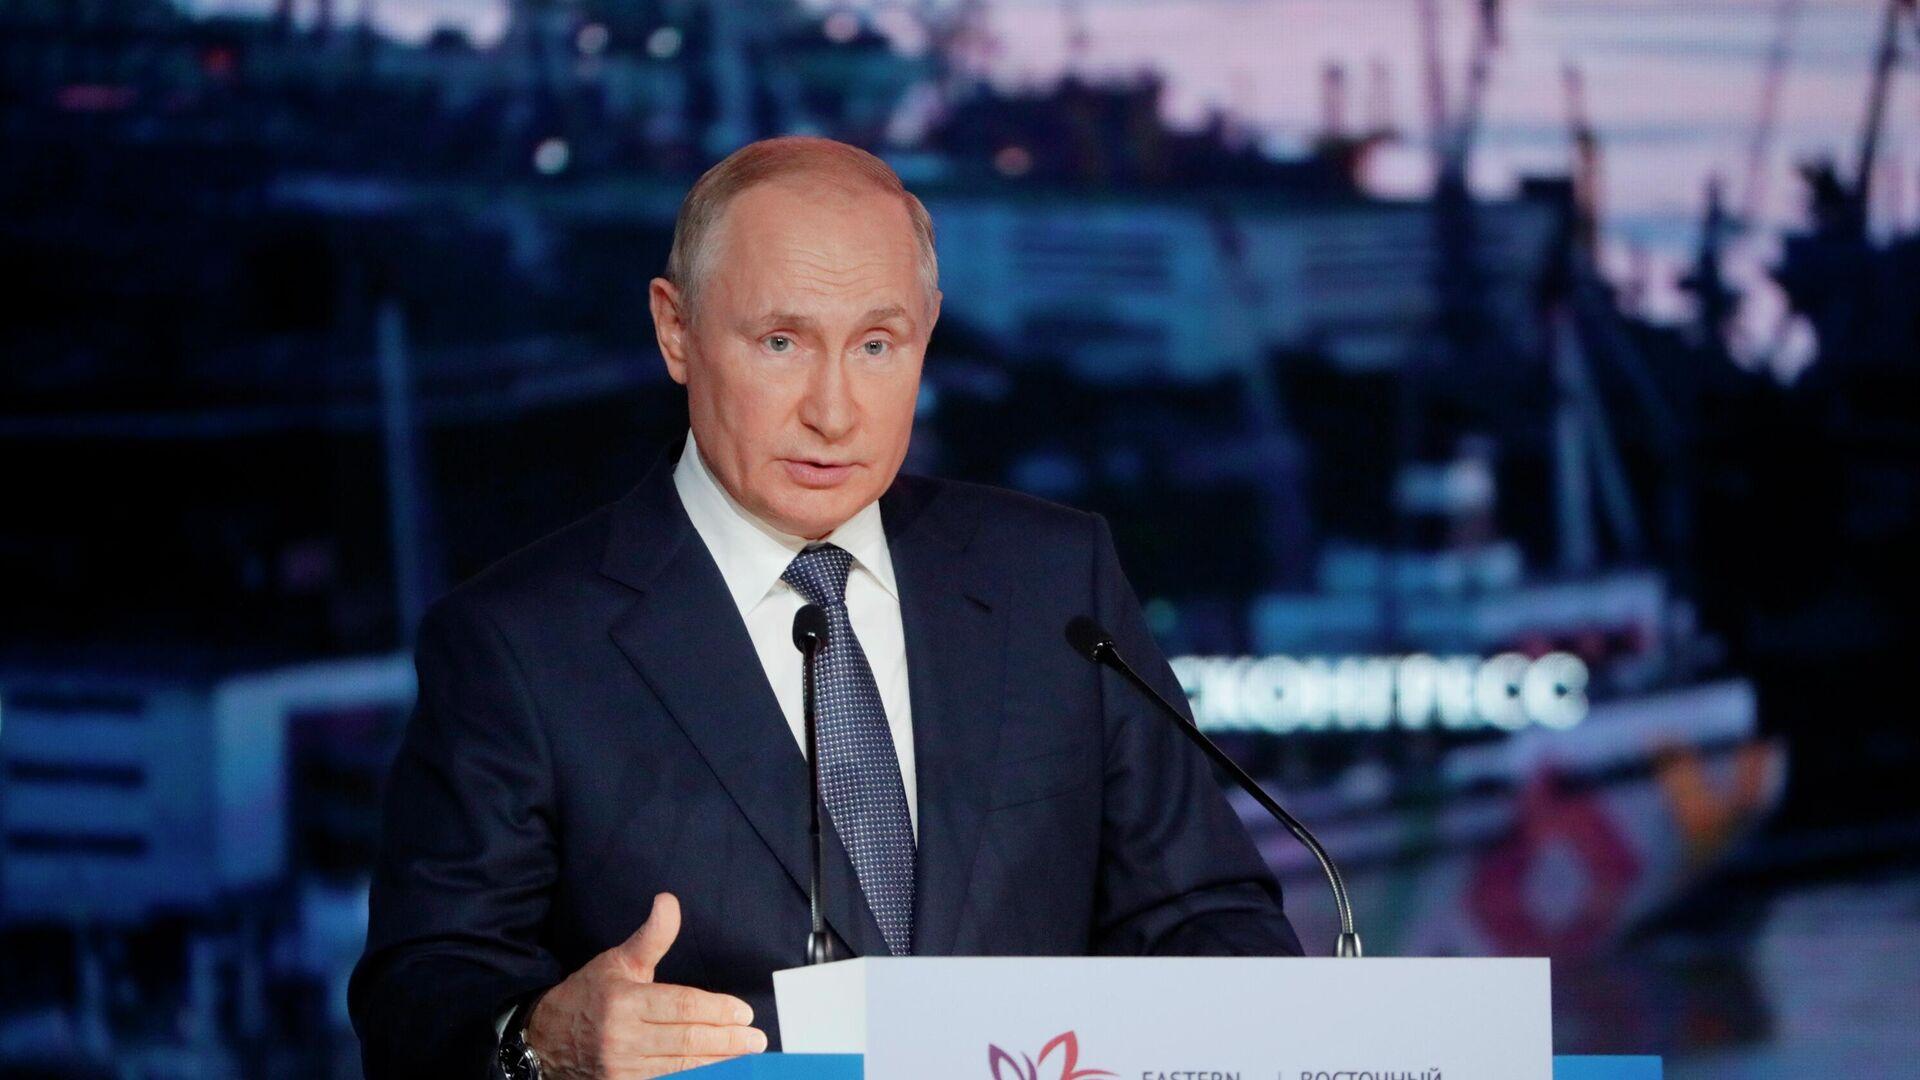 Putin beim Eastern Economic Forum, September 2021 - SNA, 1920, 04.09.2021